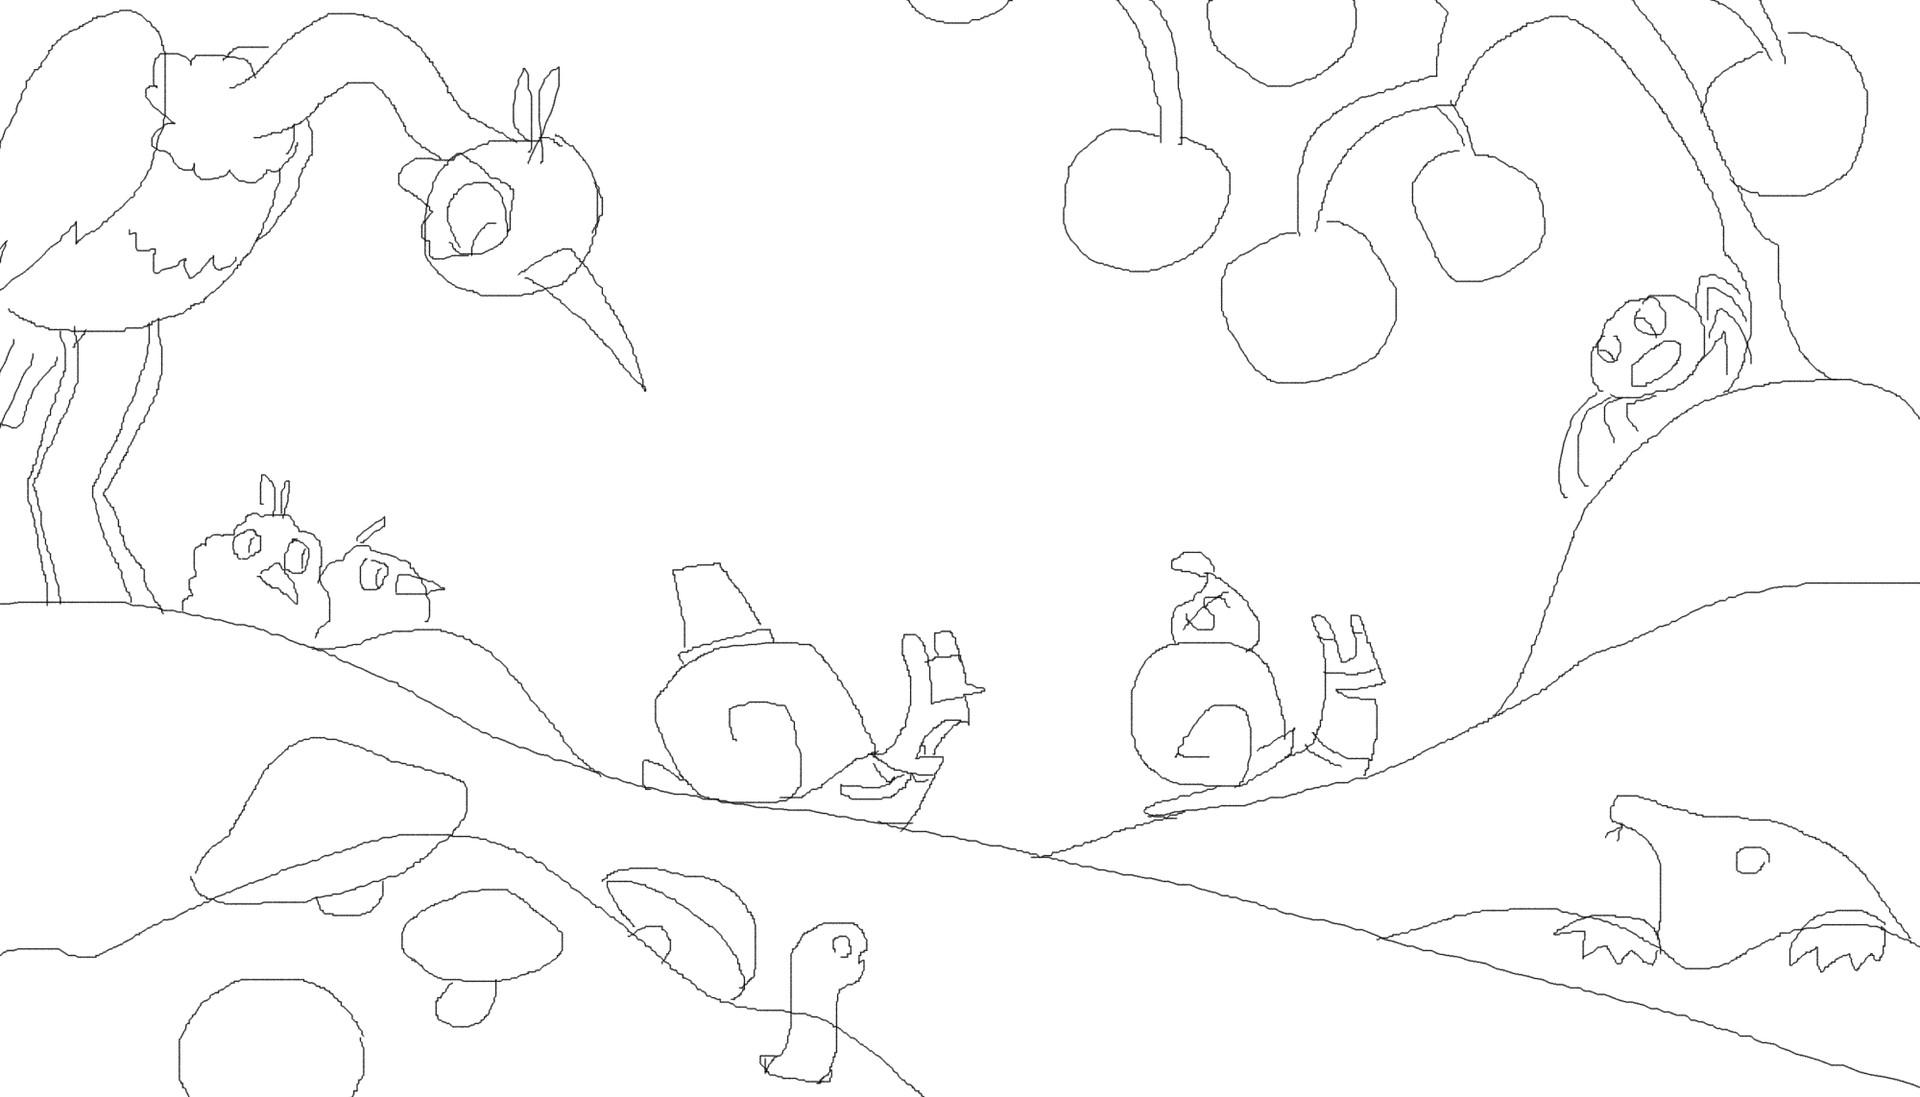 Nathan malone snails sketch